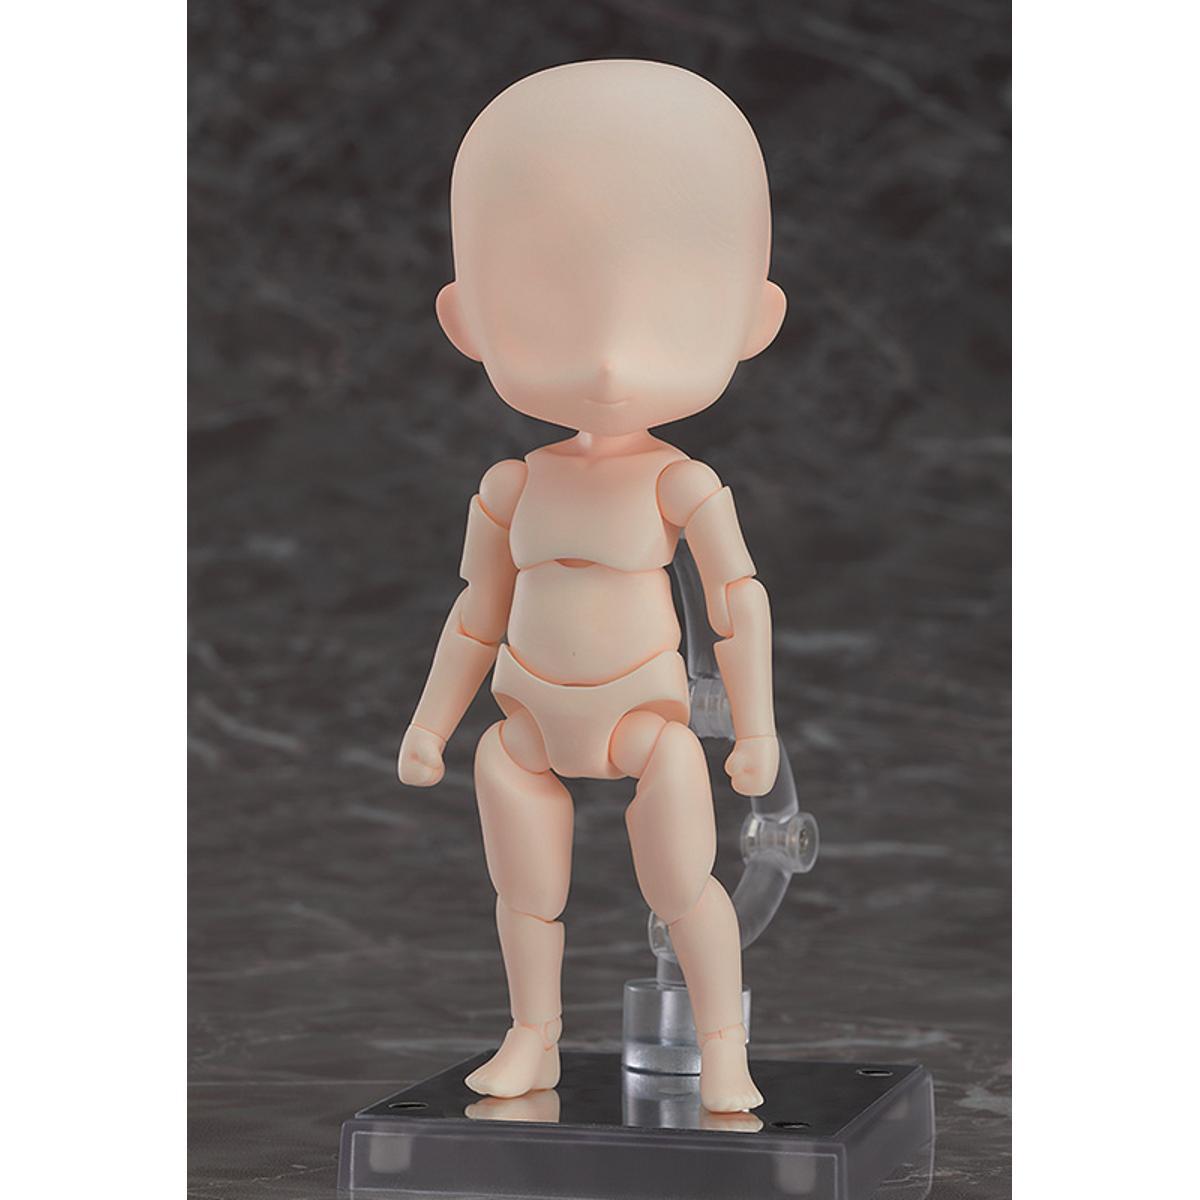 Nendoroid Doll archetype 1.1: Boy (Cream)